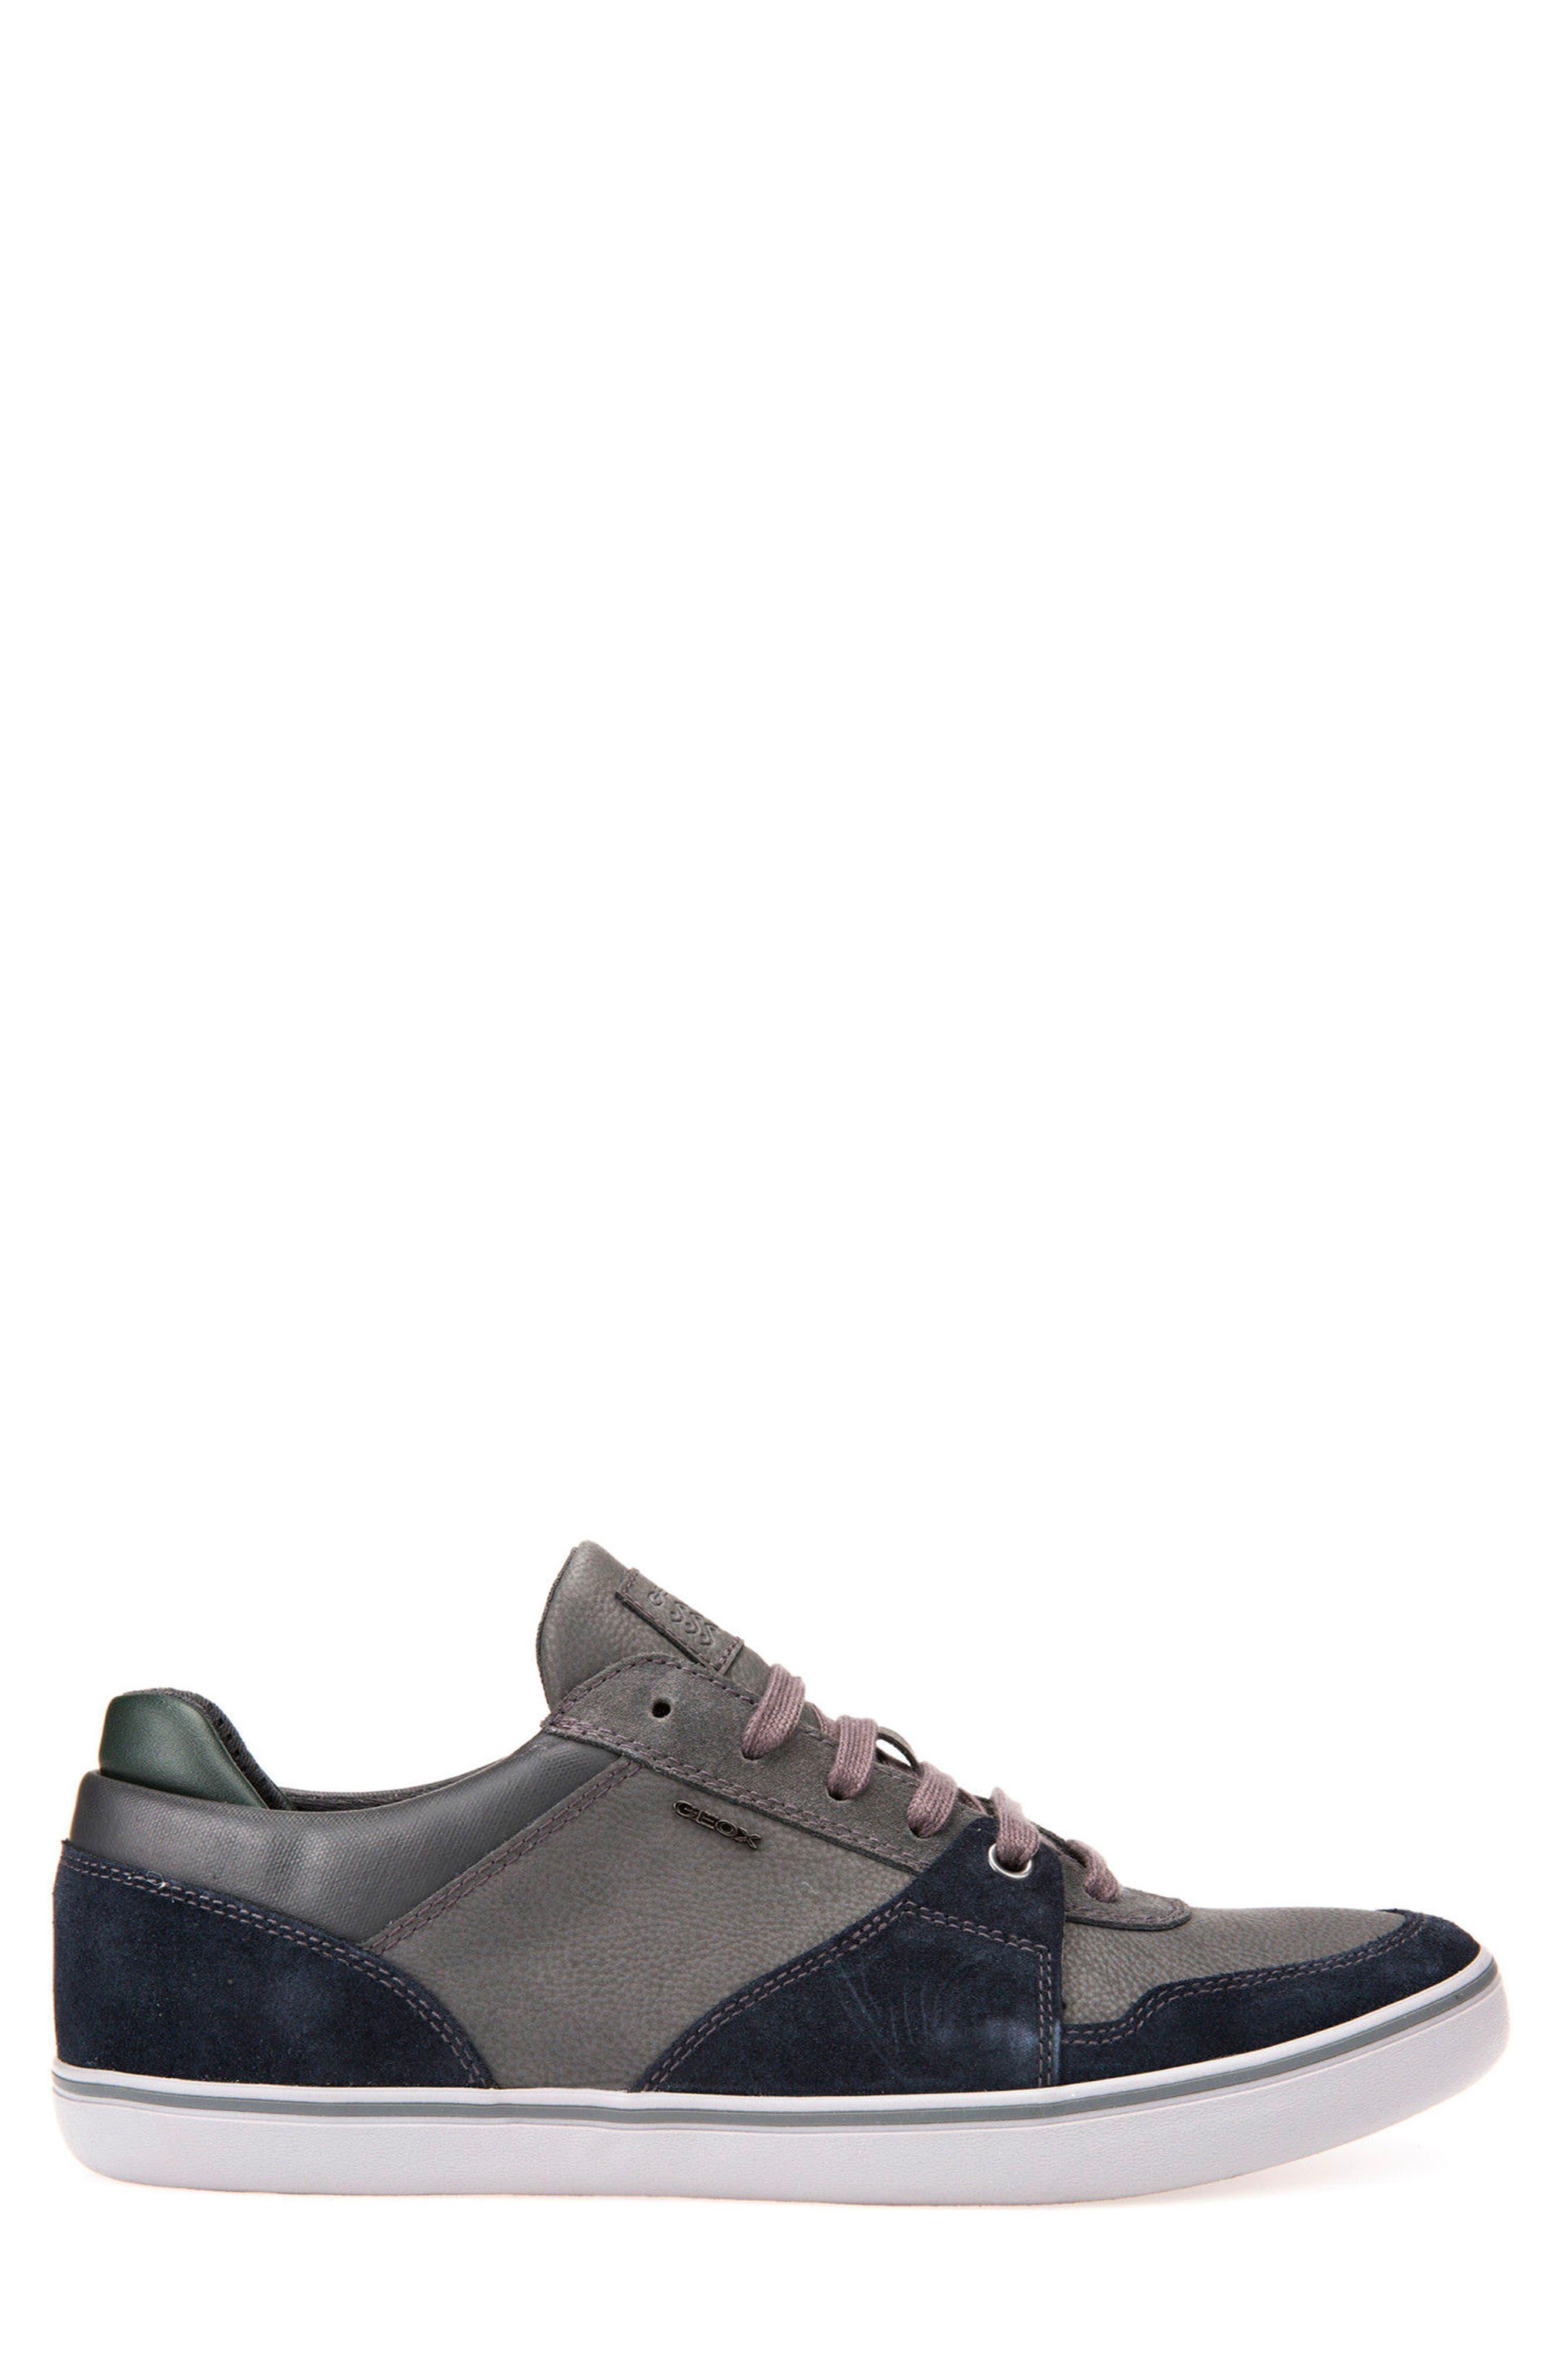 Box 26 Low Top Sneaker,                             Alternate thumbnail 3, color,                             461